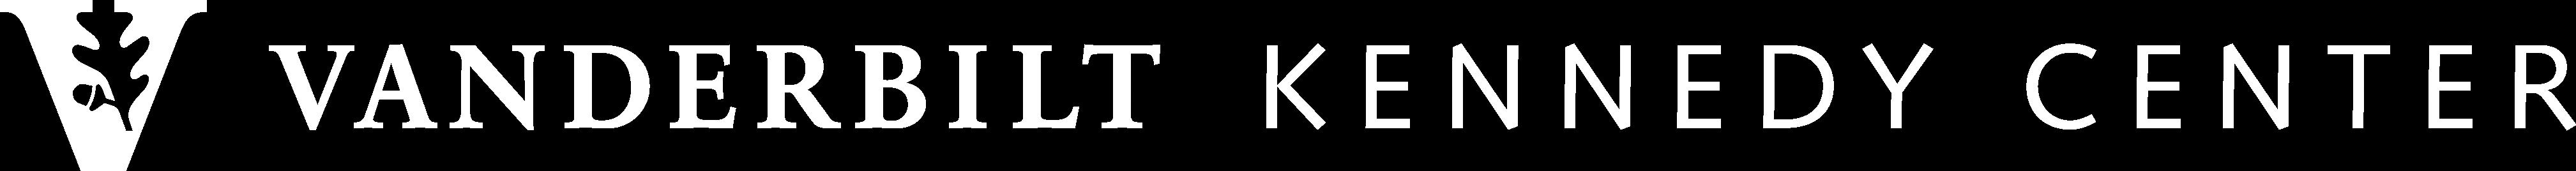 Vanderbilt Kennedy Center logo